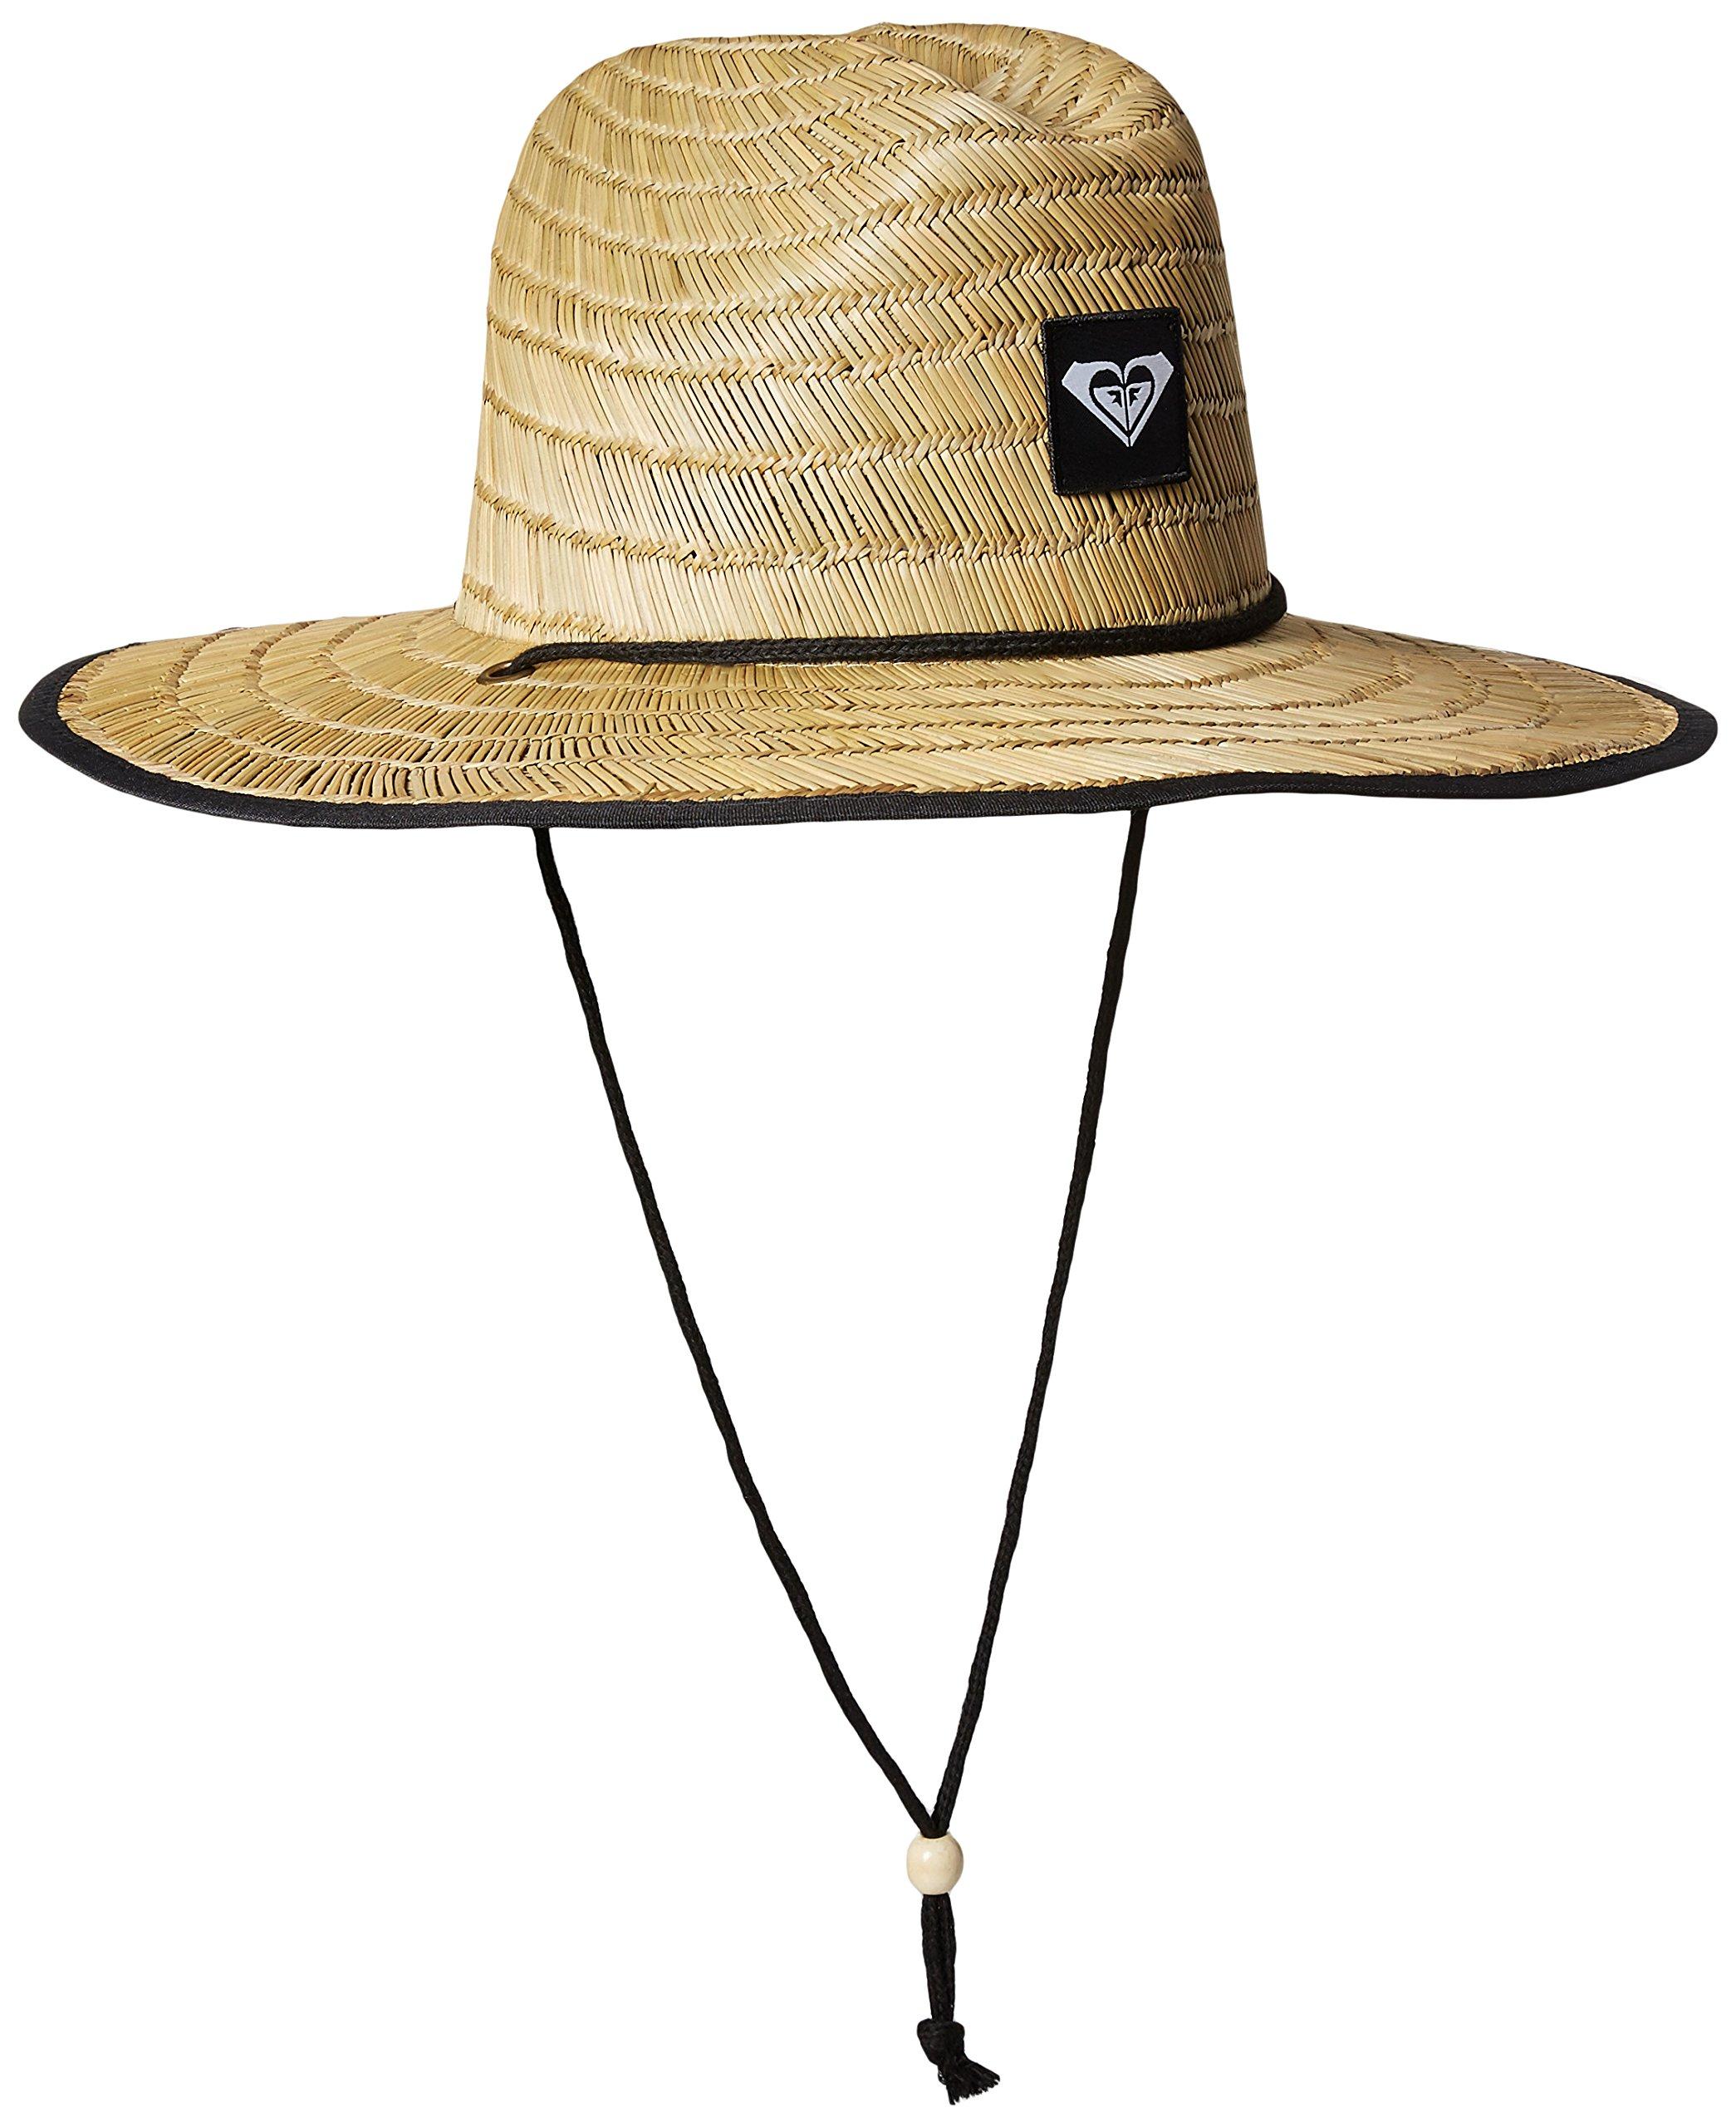 Roxy Women's Tomboy 2 Straw Sun Protection Hat, True Black, M/L